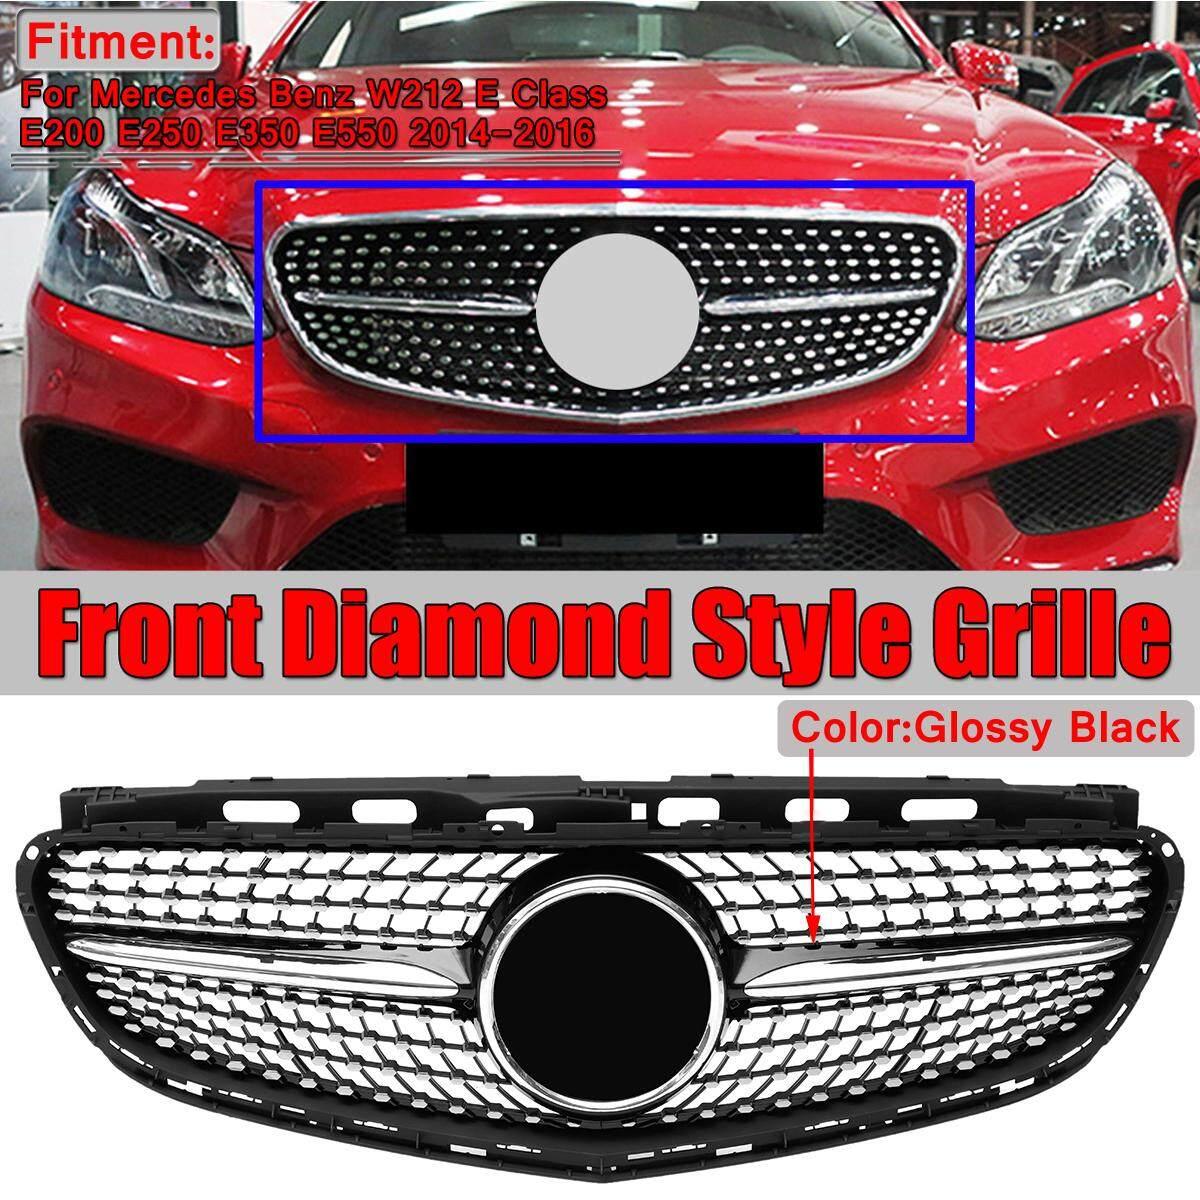 【Free Pengiriman + Flash Deal】diamond Gaya Grill Depan Grille untuk Mercedes Benz W212 E250 E550 E350 2014-2016